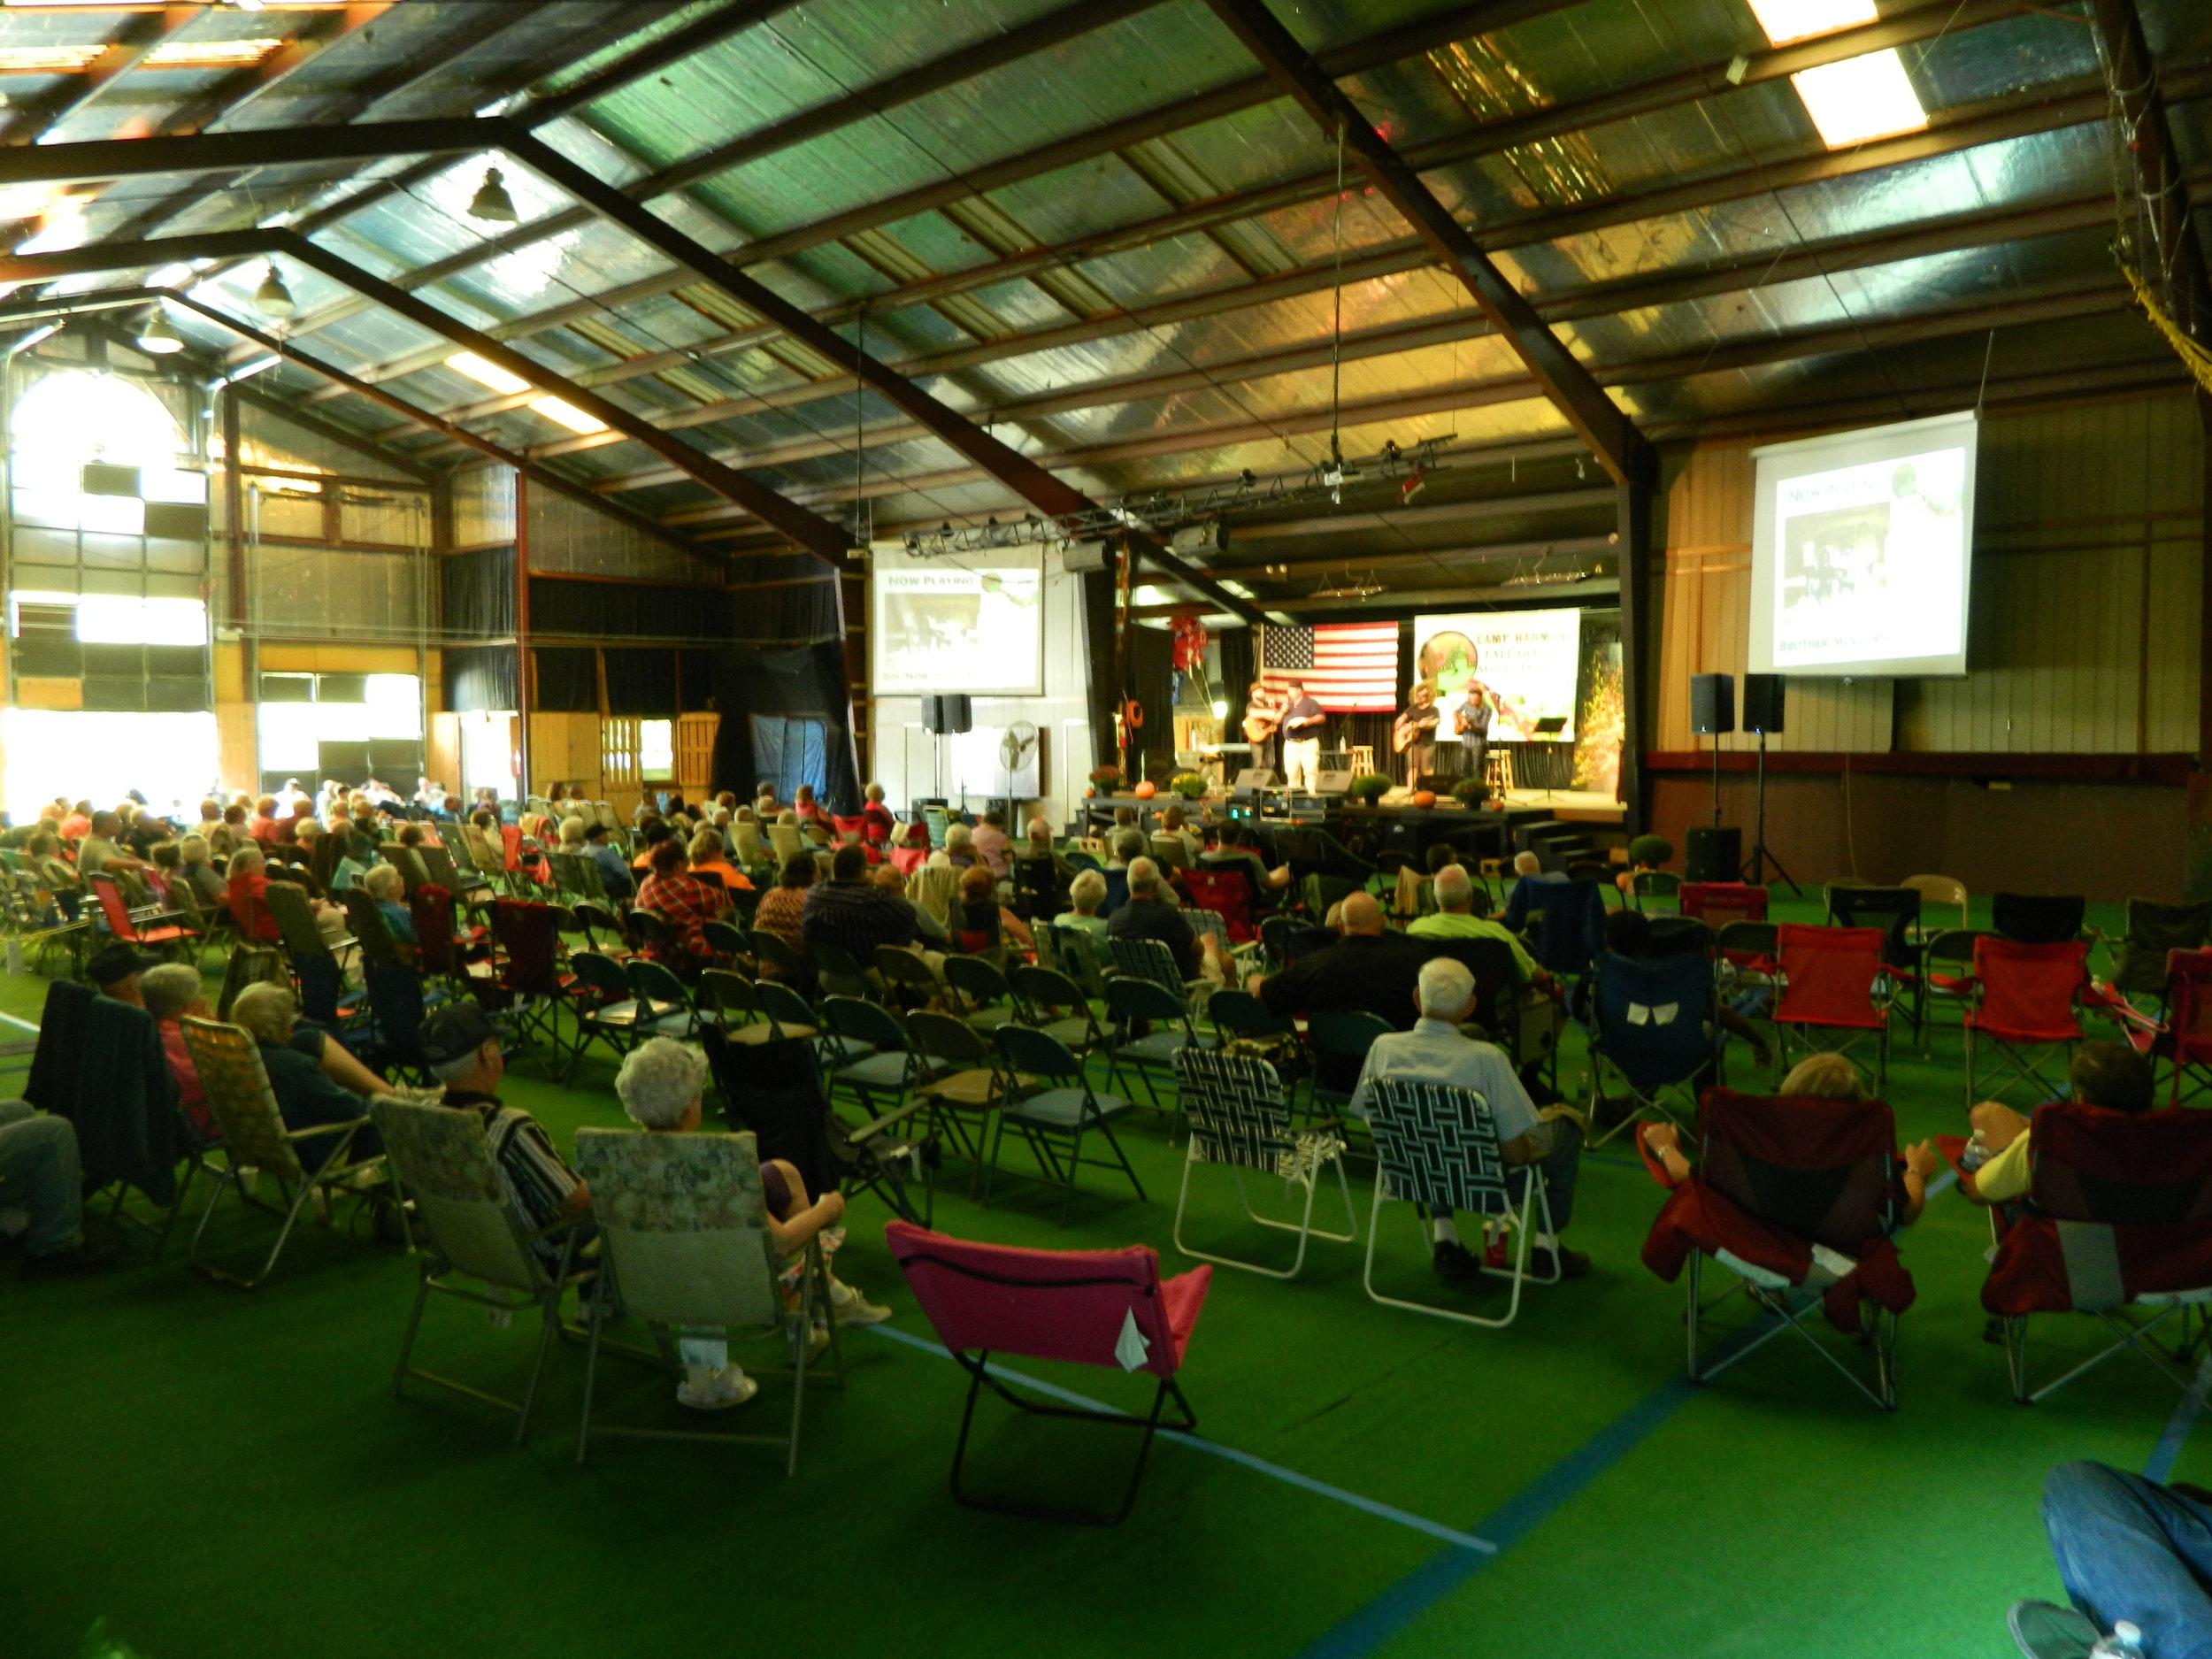 Tabernacle during Fall Gospel Music Festival